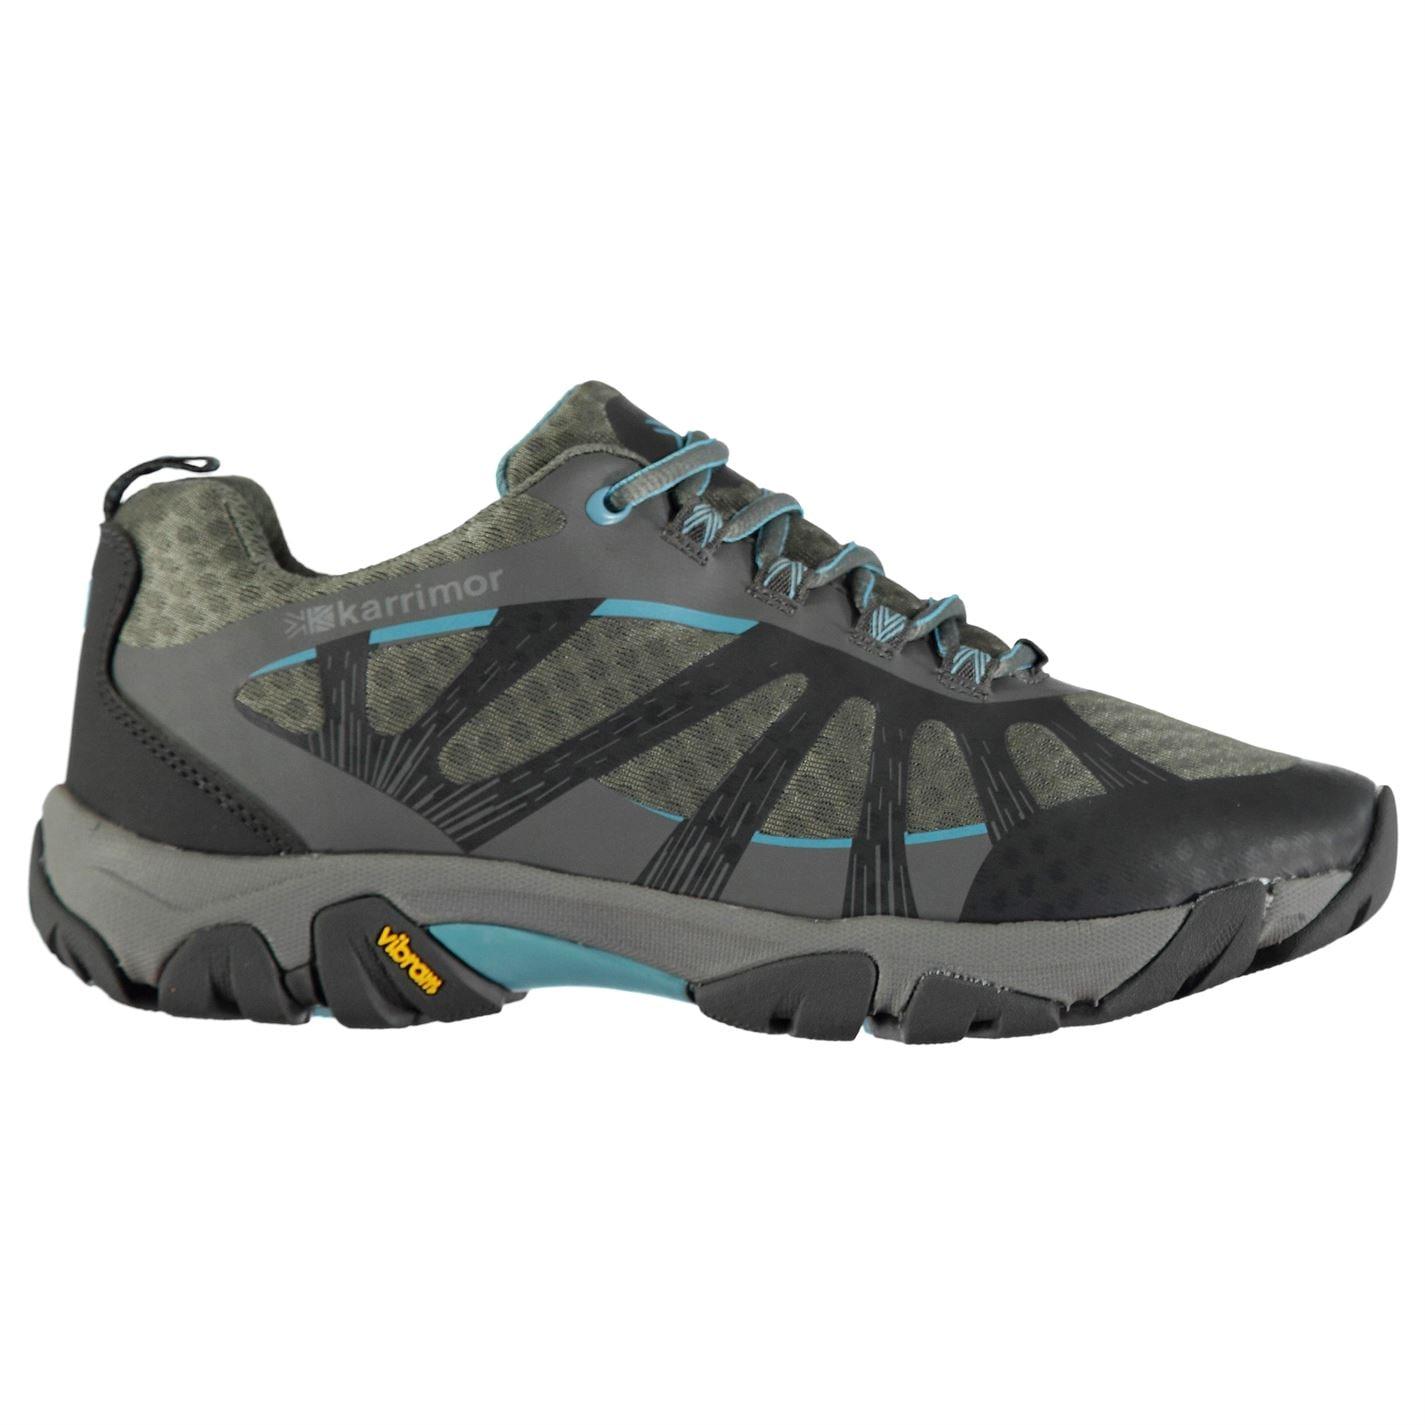 Karrimor Serenity Ladies Walking Shoes Dámská outdoorová obuv 18709402 8 (42)